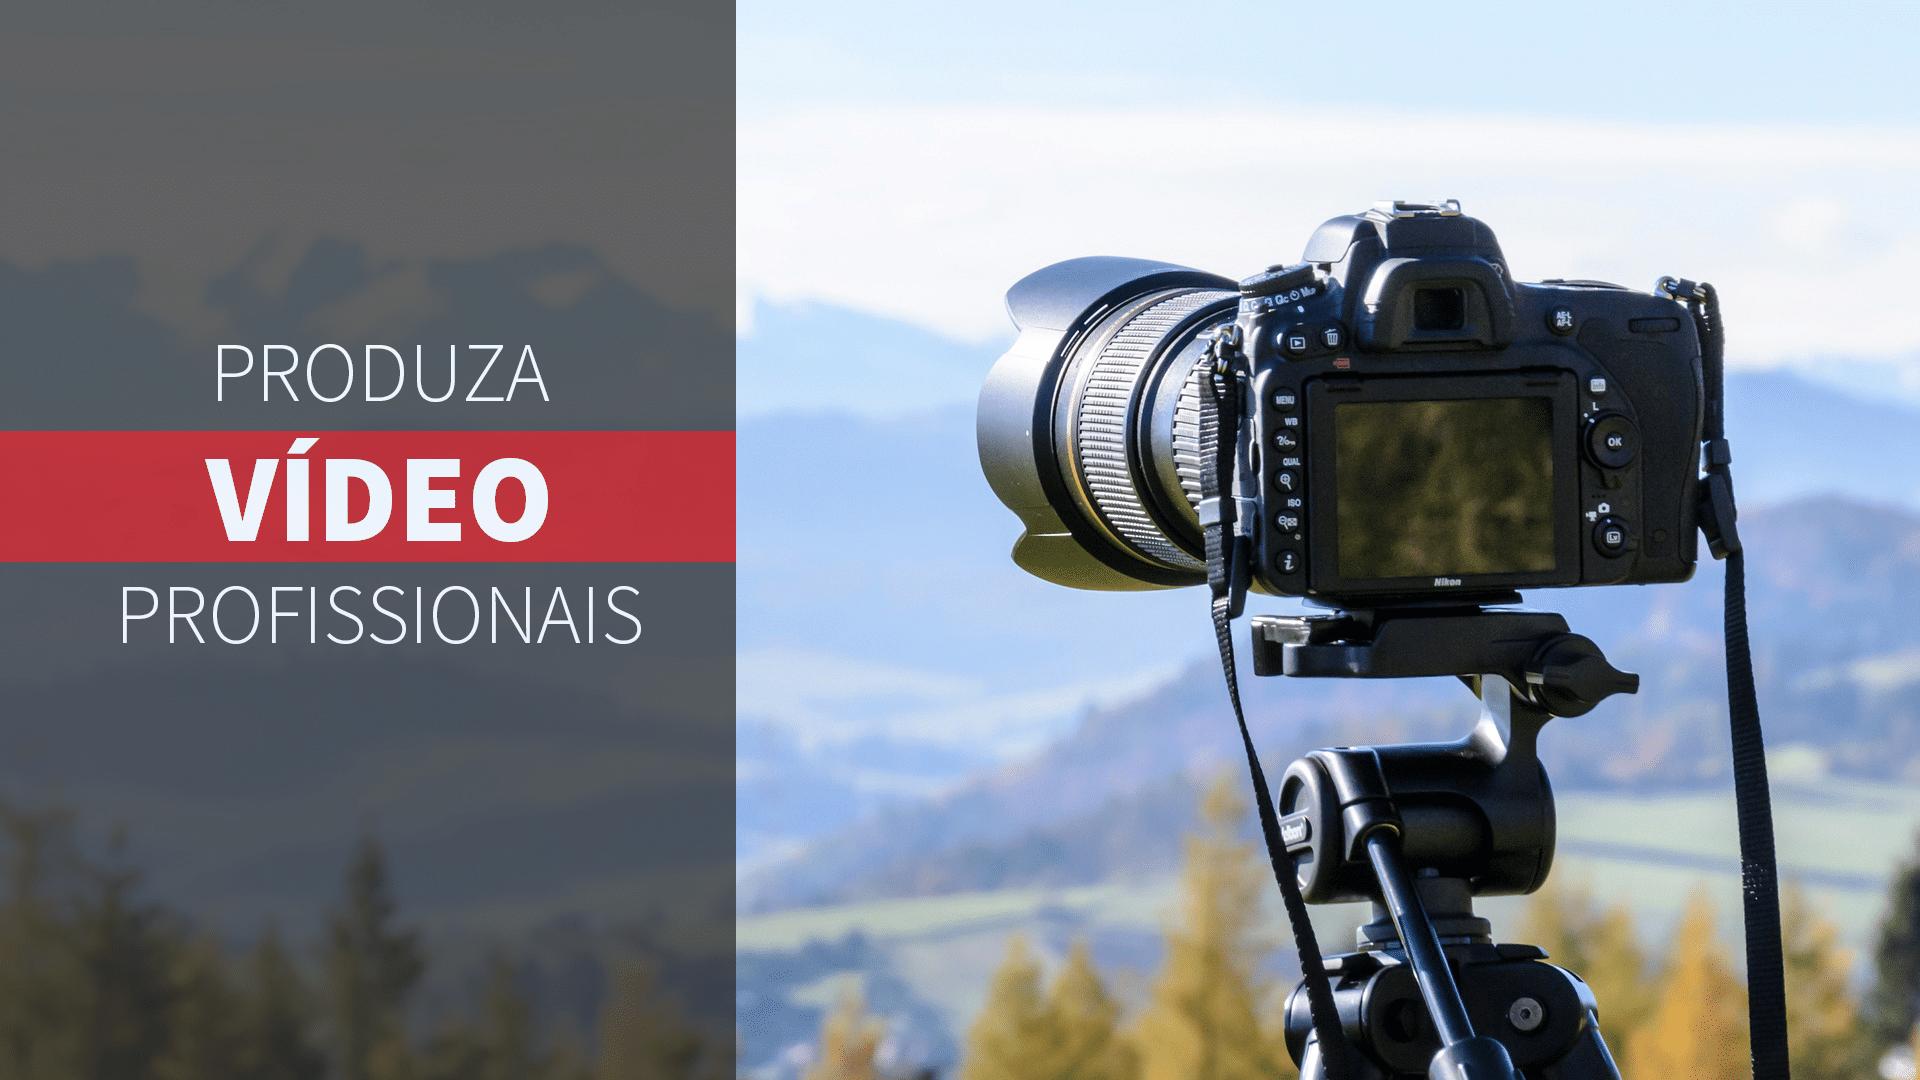 PRODUZIR VIDEOS PROFISSIONAIS